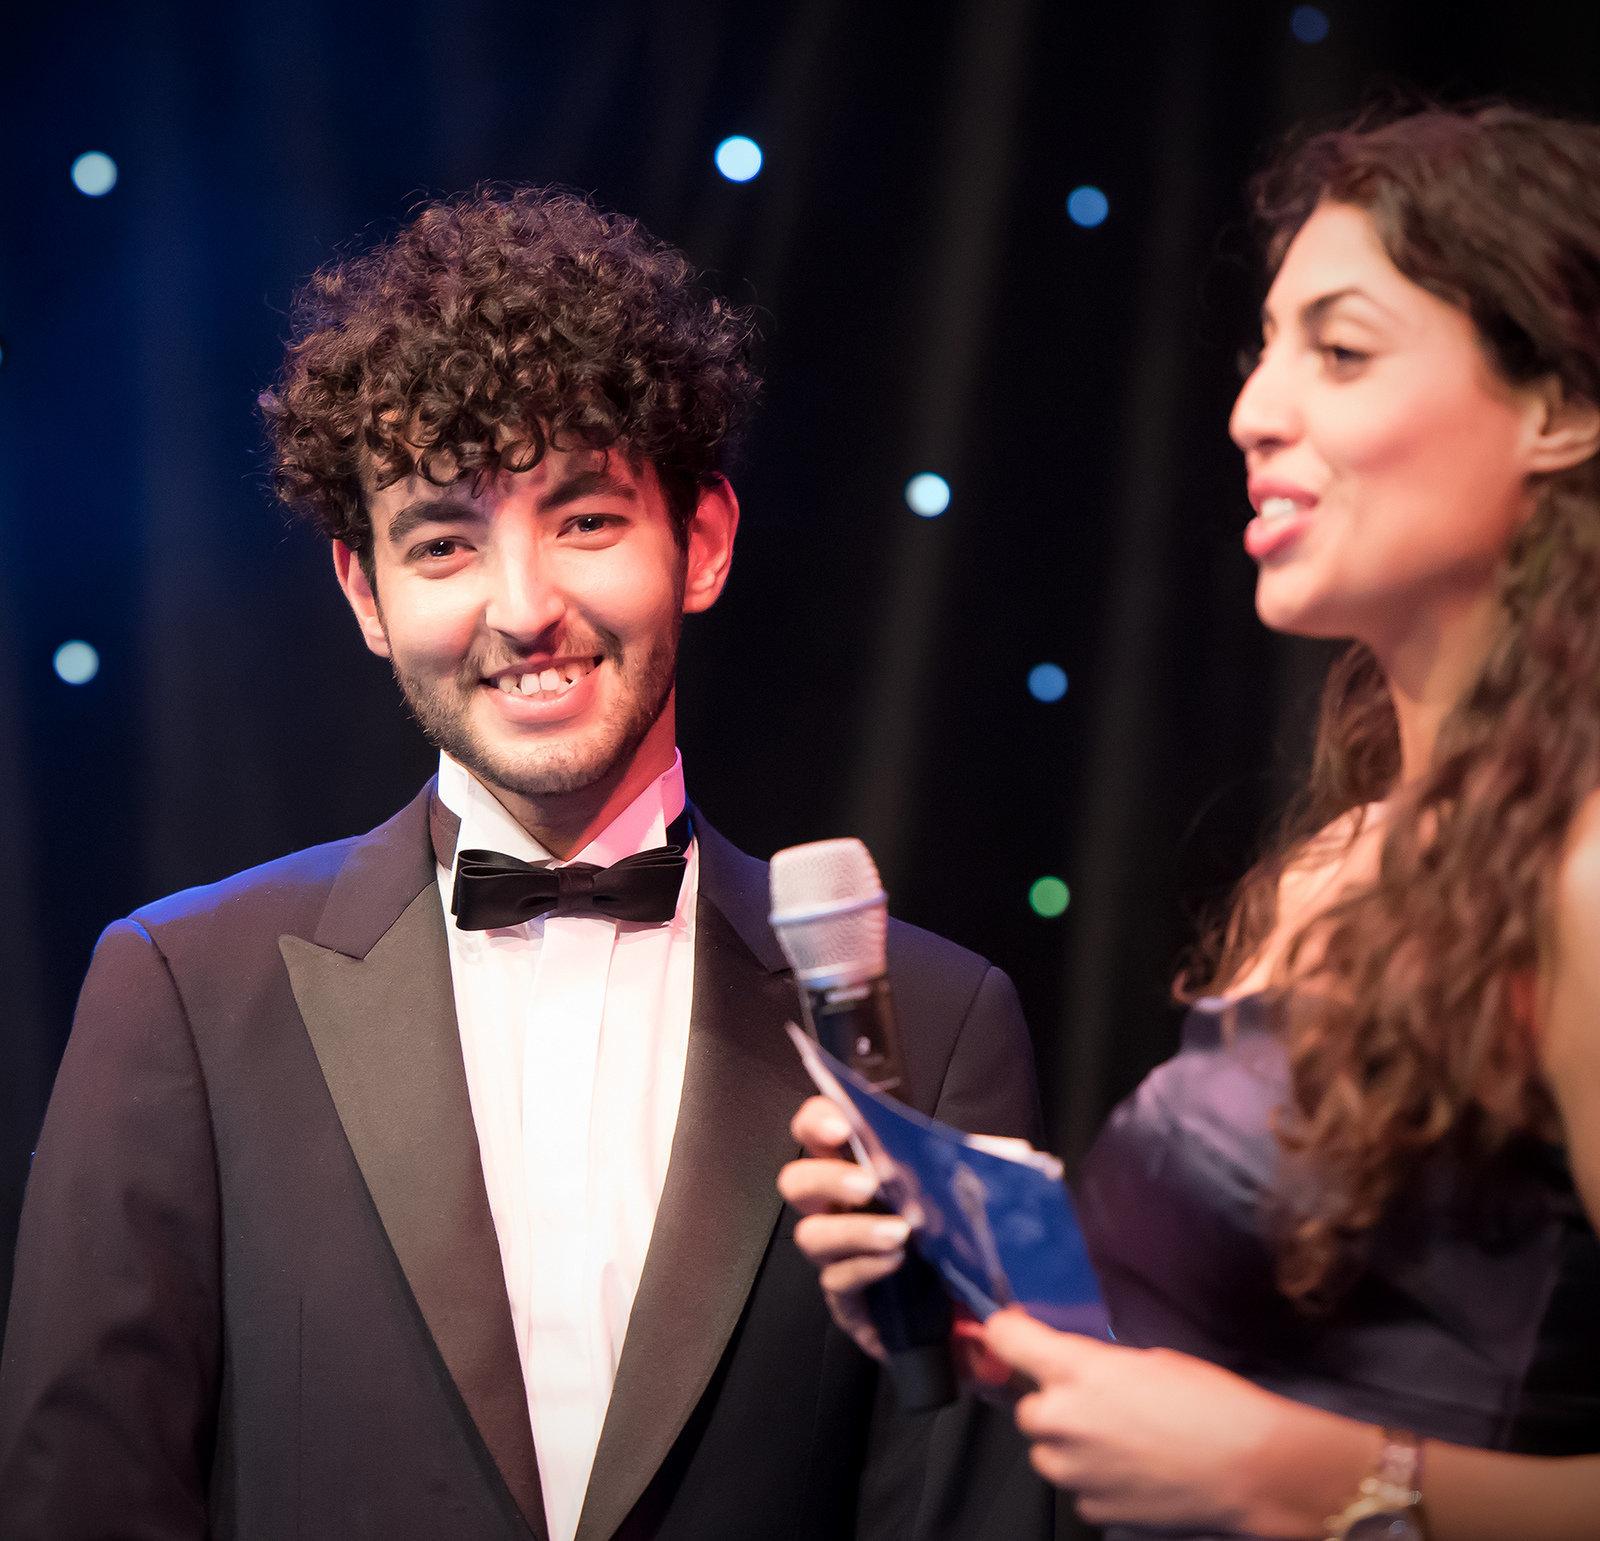 Le styliste marocain Karim Adduchi primé au Amsterdam Culture Business Award 2018